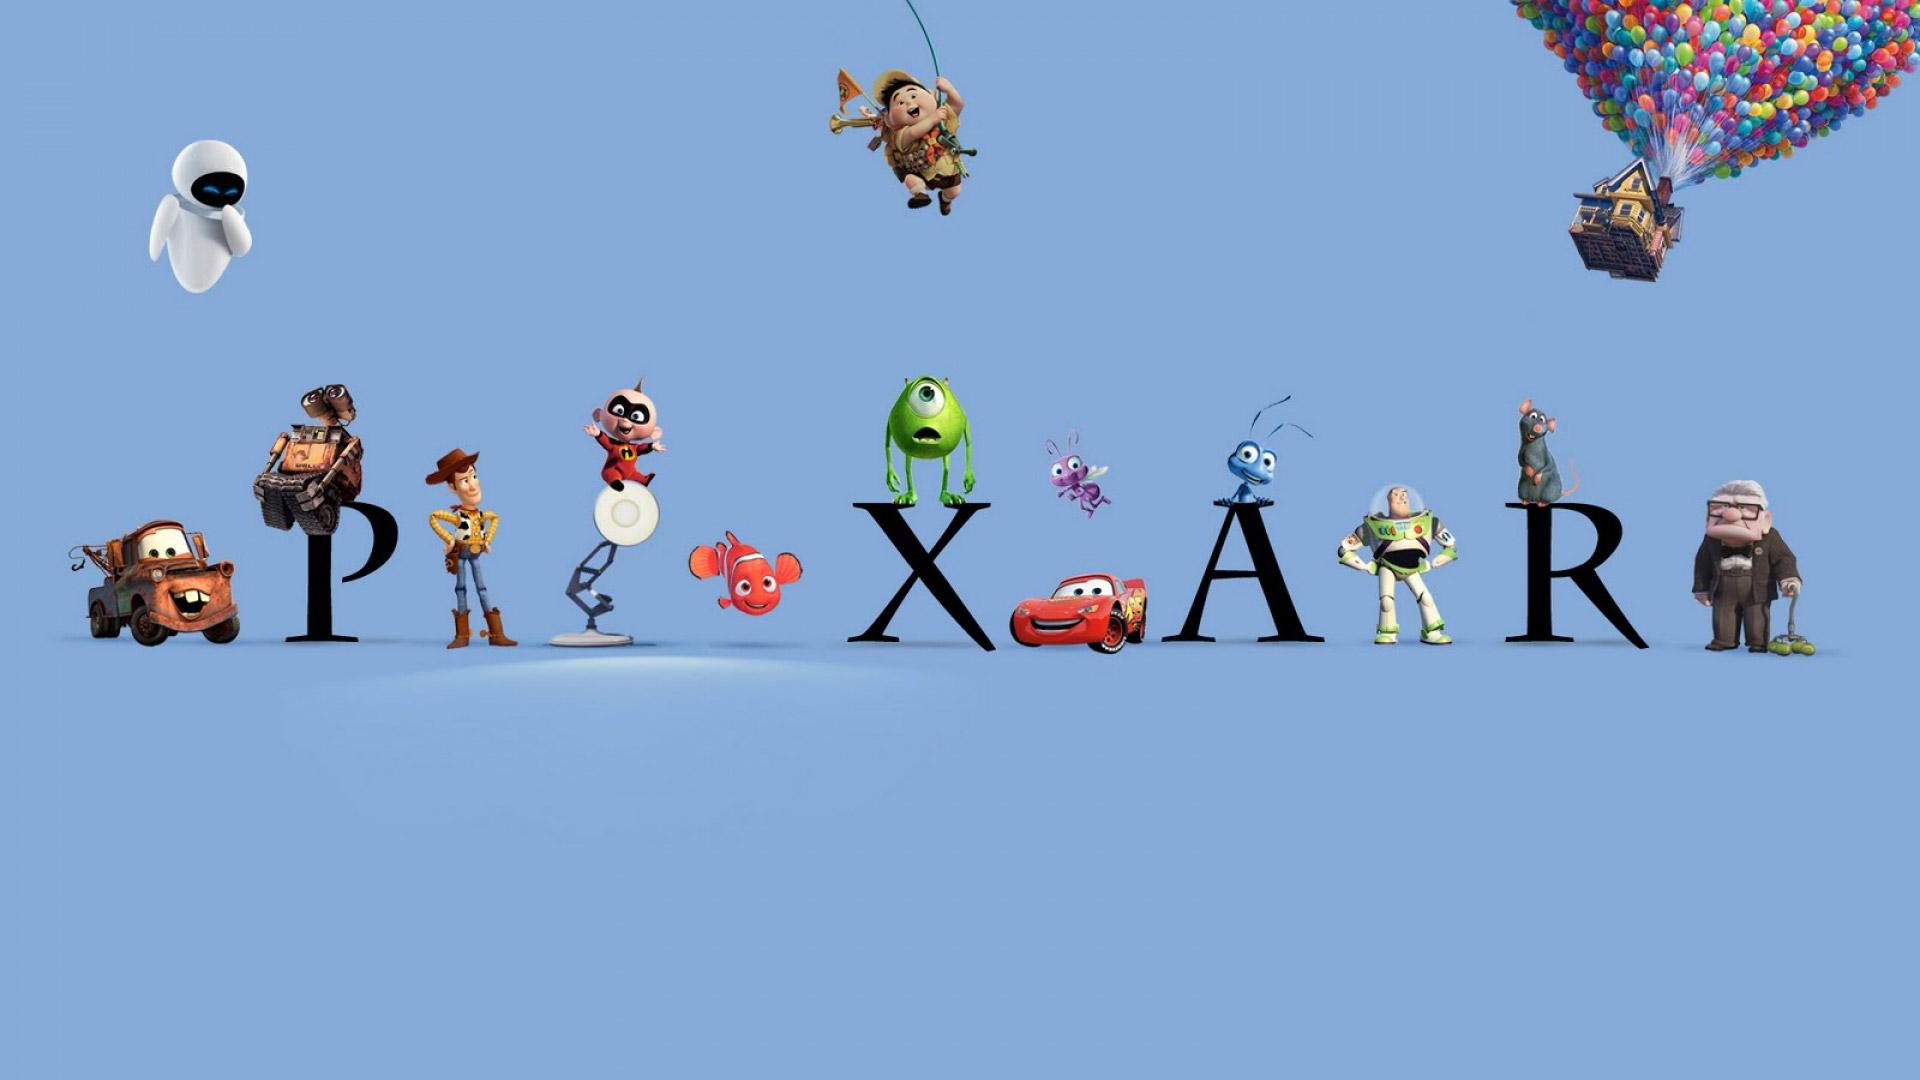 Pixar HD Wallpaper FullHDWpp   Full HD Wallpapers 1920x1080 1920x1080